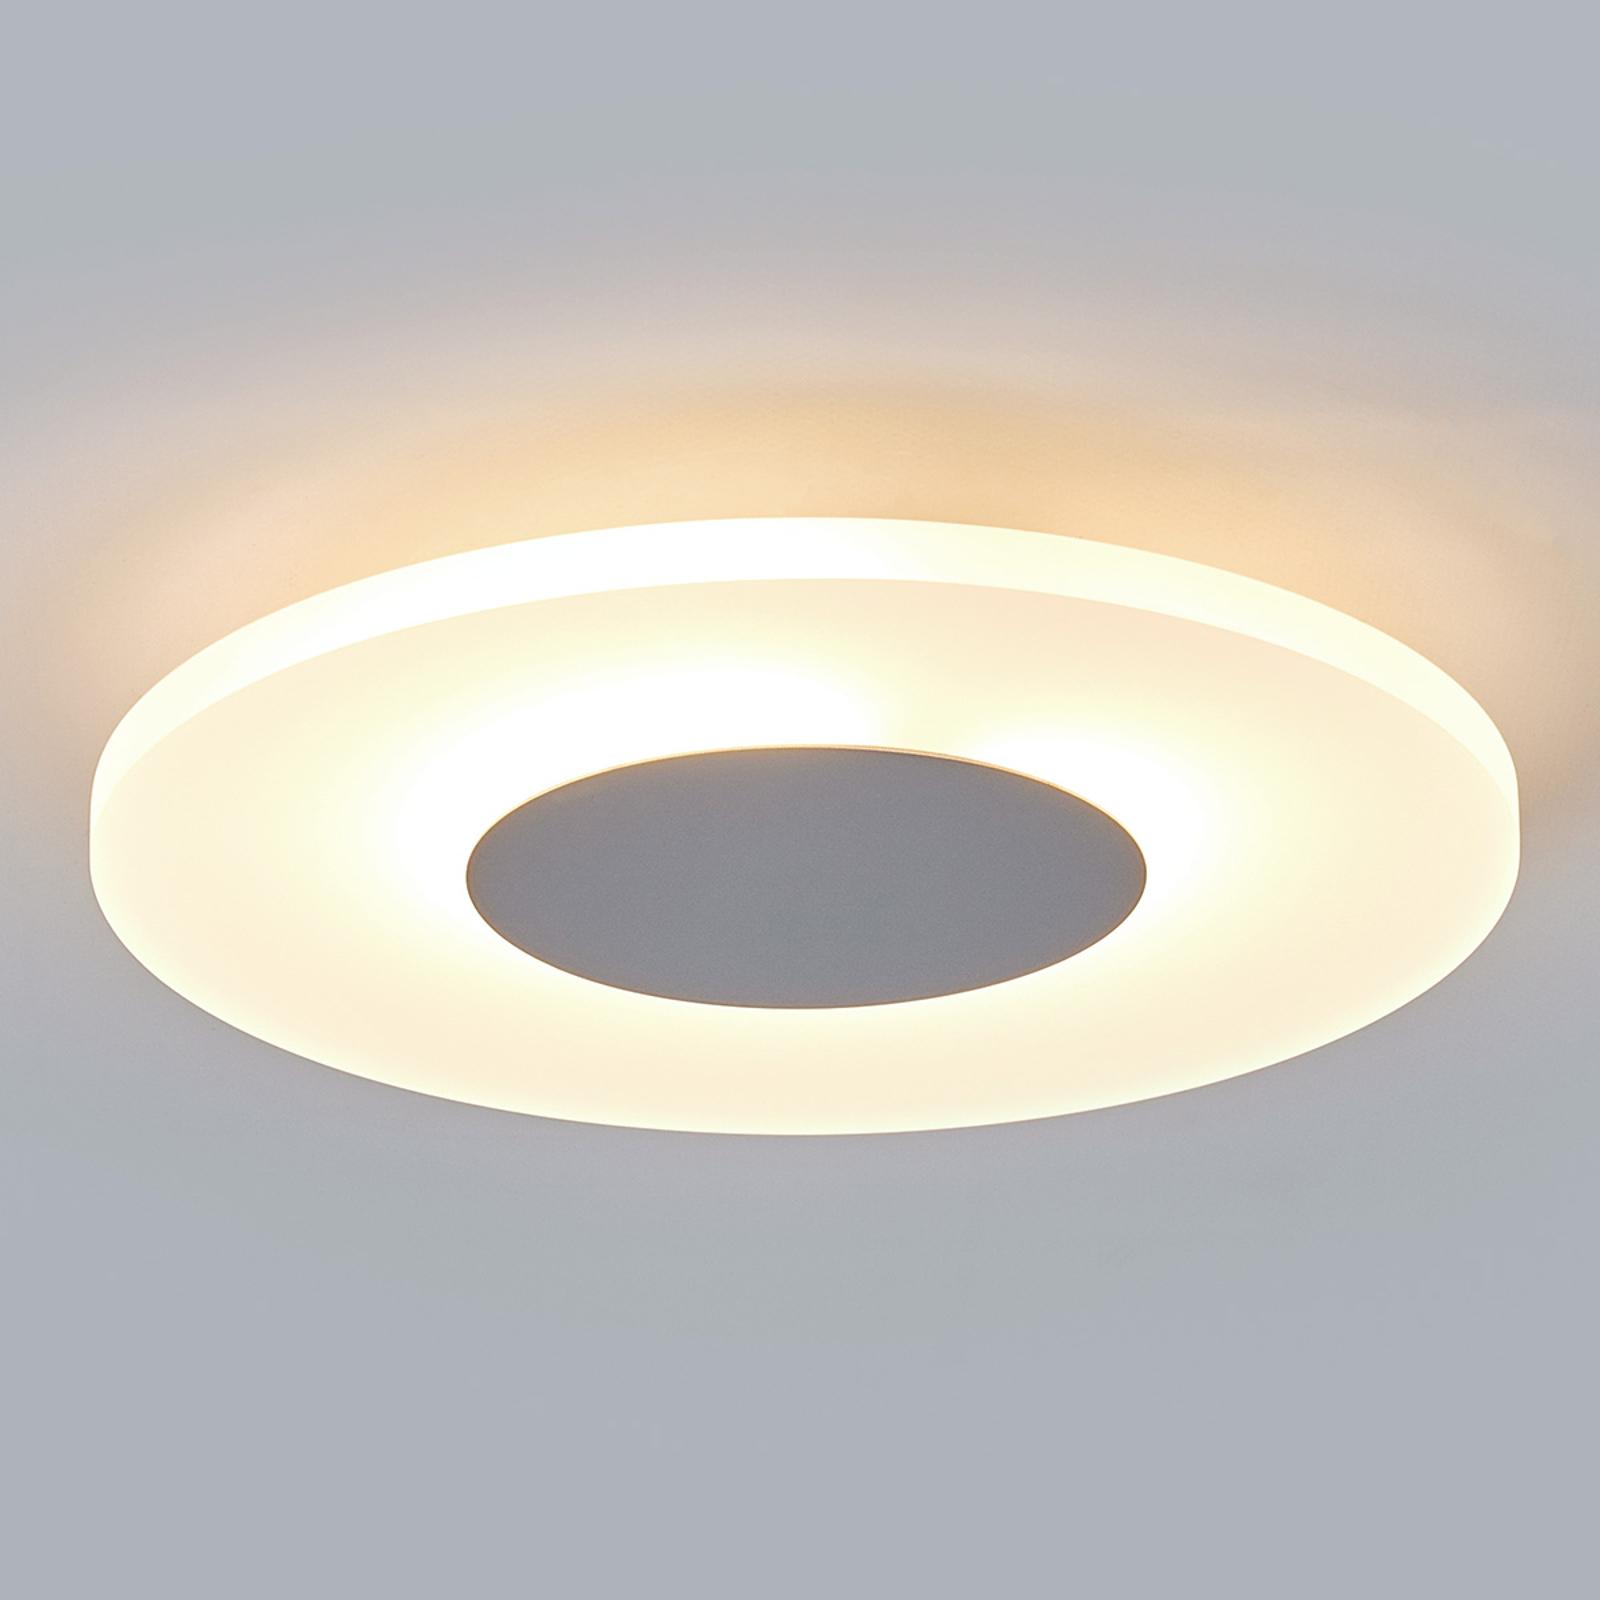 Dekoracyjna lampa sufitowa LED TARJA